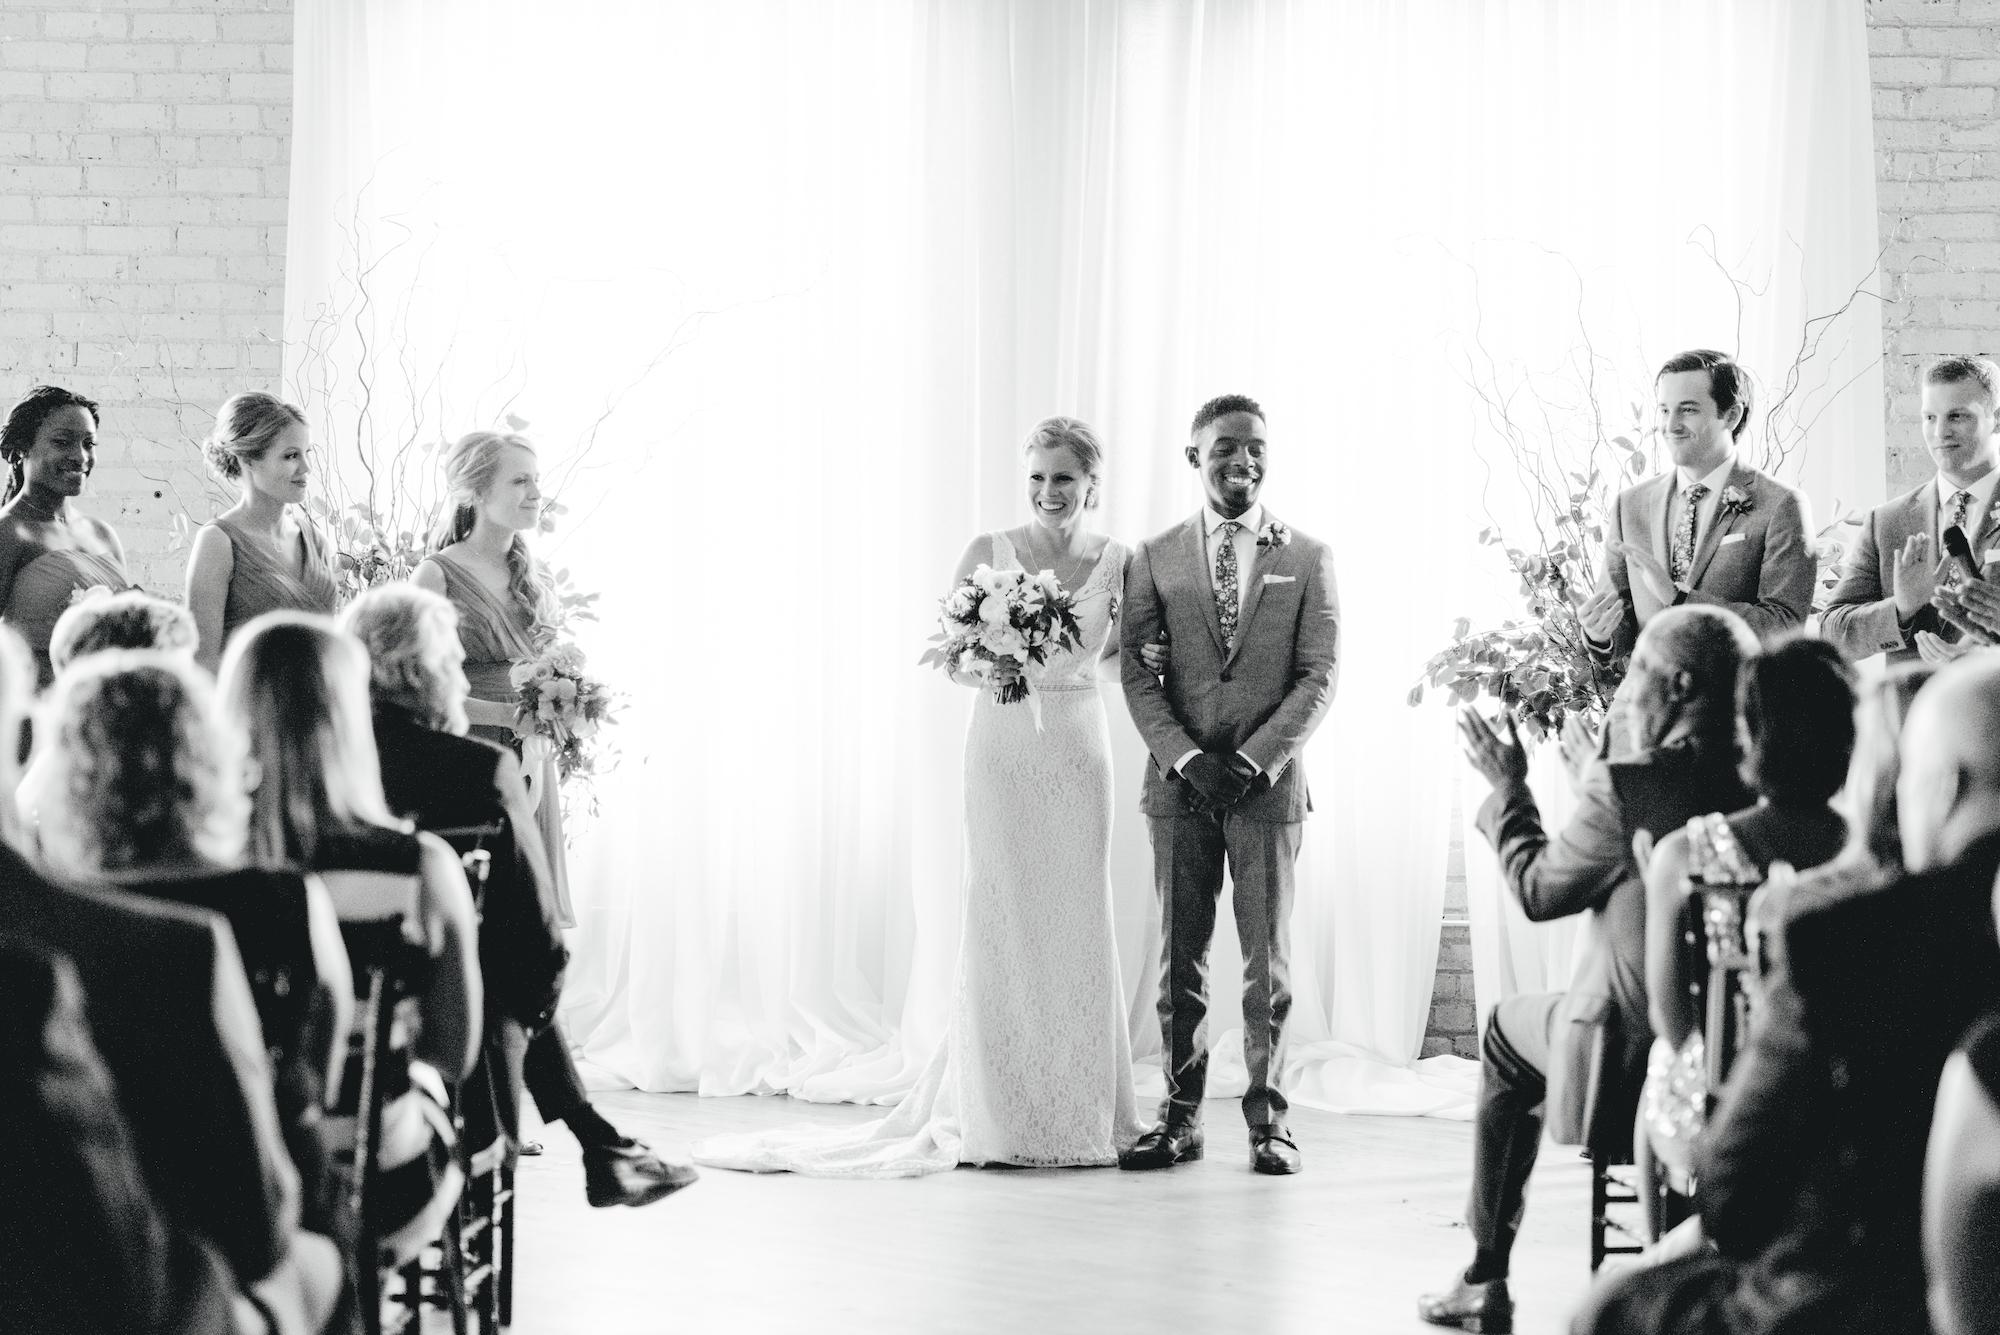 Roy_Son_Photo_Acowsay_Cinema_MN_Wedding_23.jpg